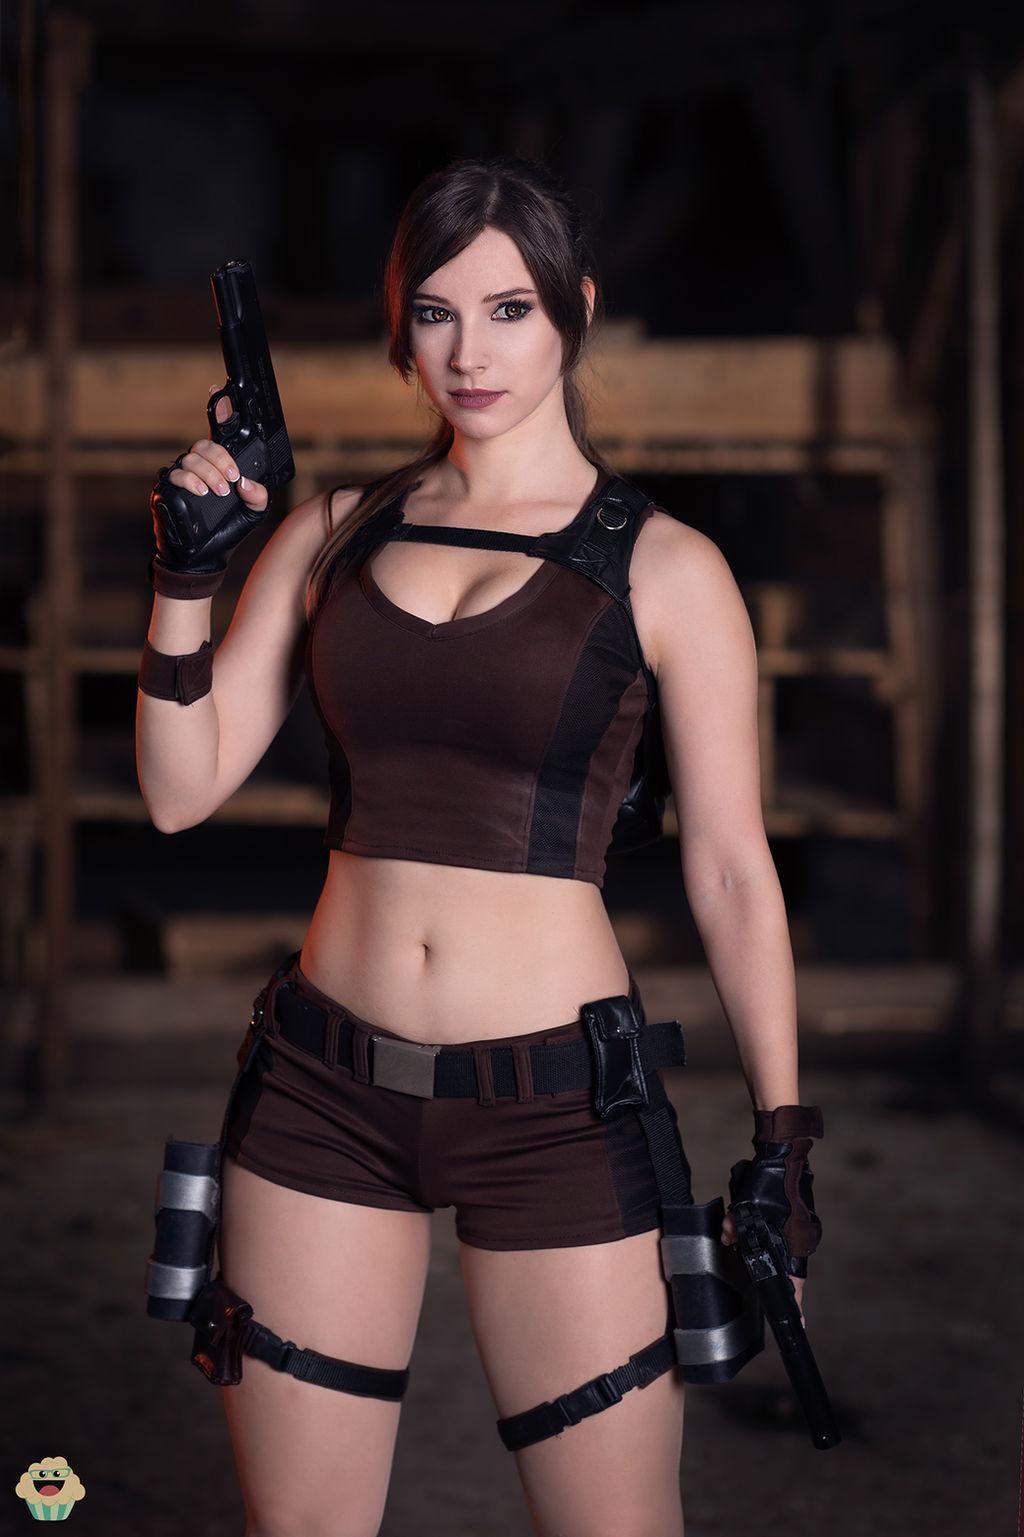 Lara Croft Tomb Raider Cosplay Ii By Enjinight On Deviantart